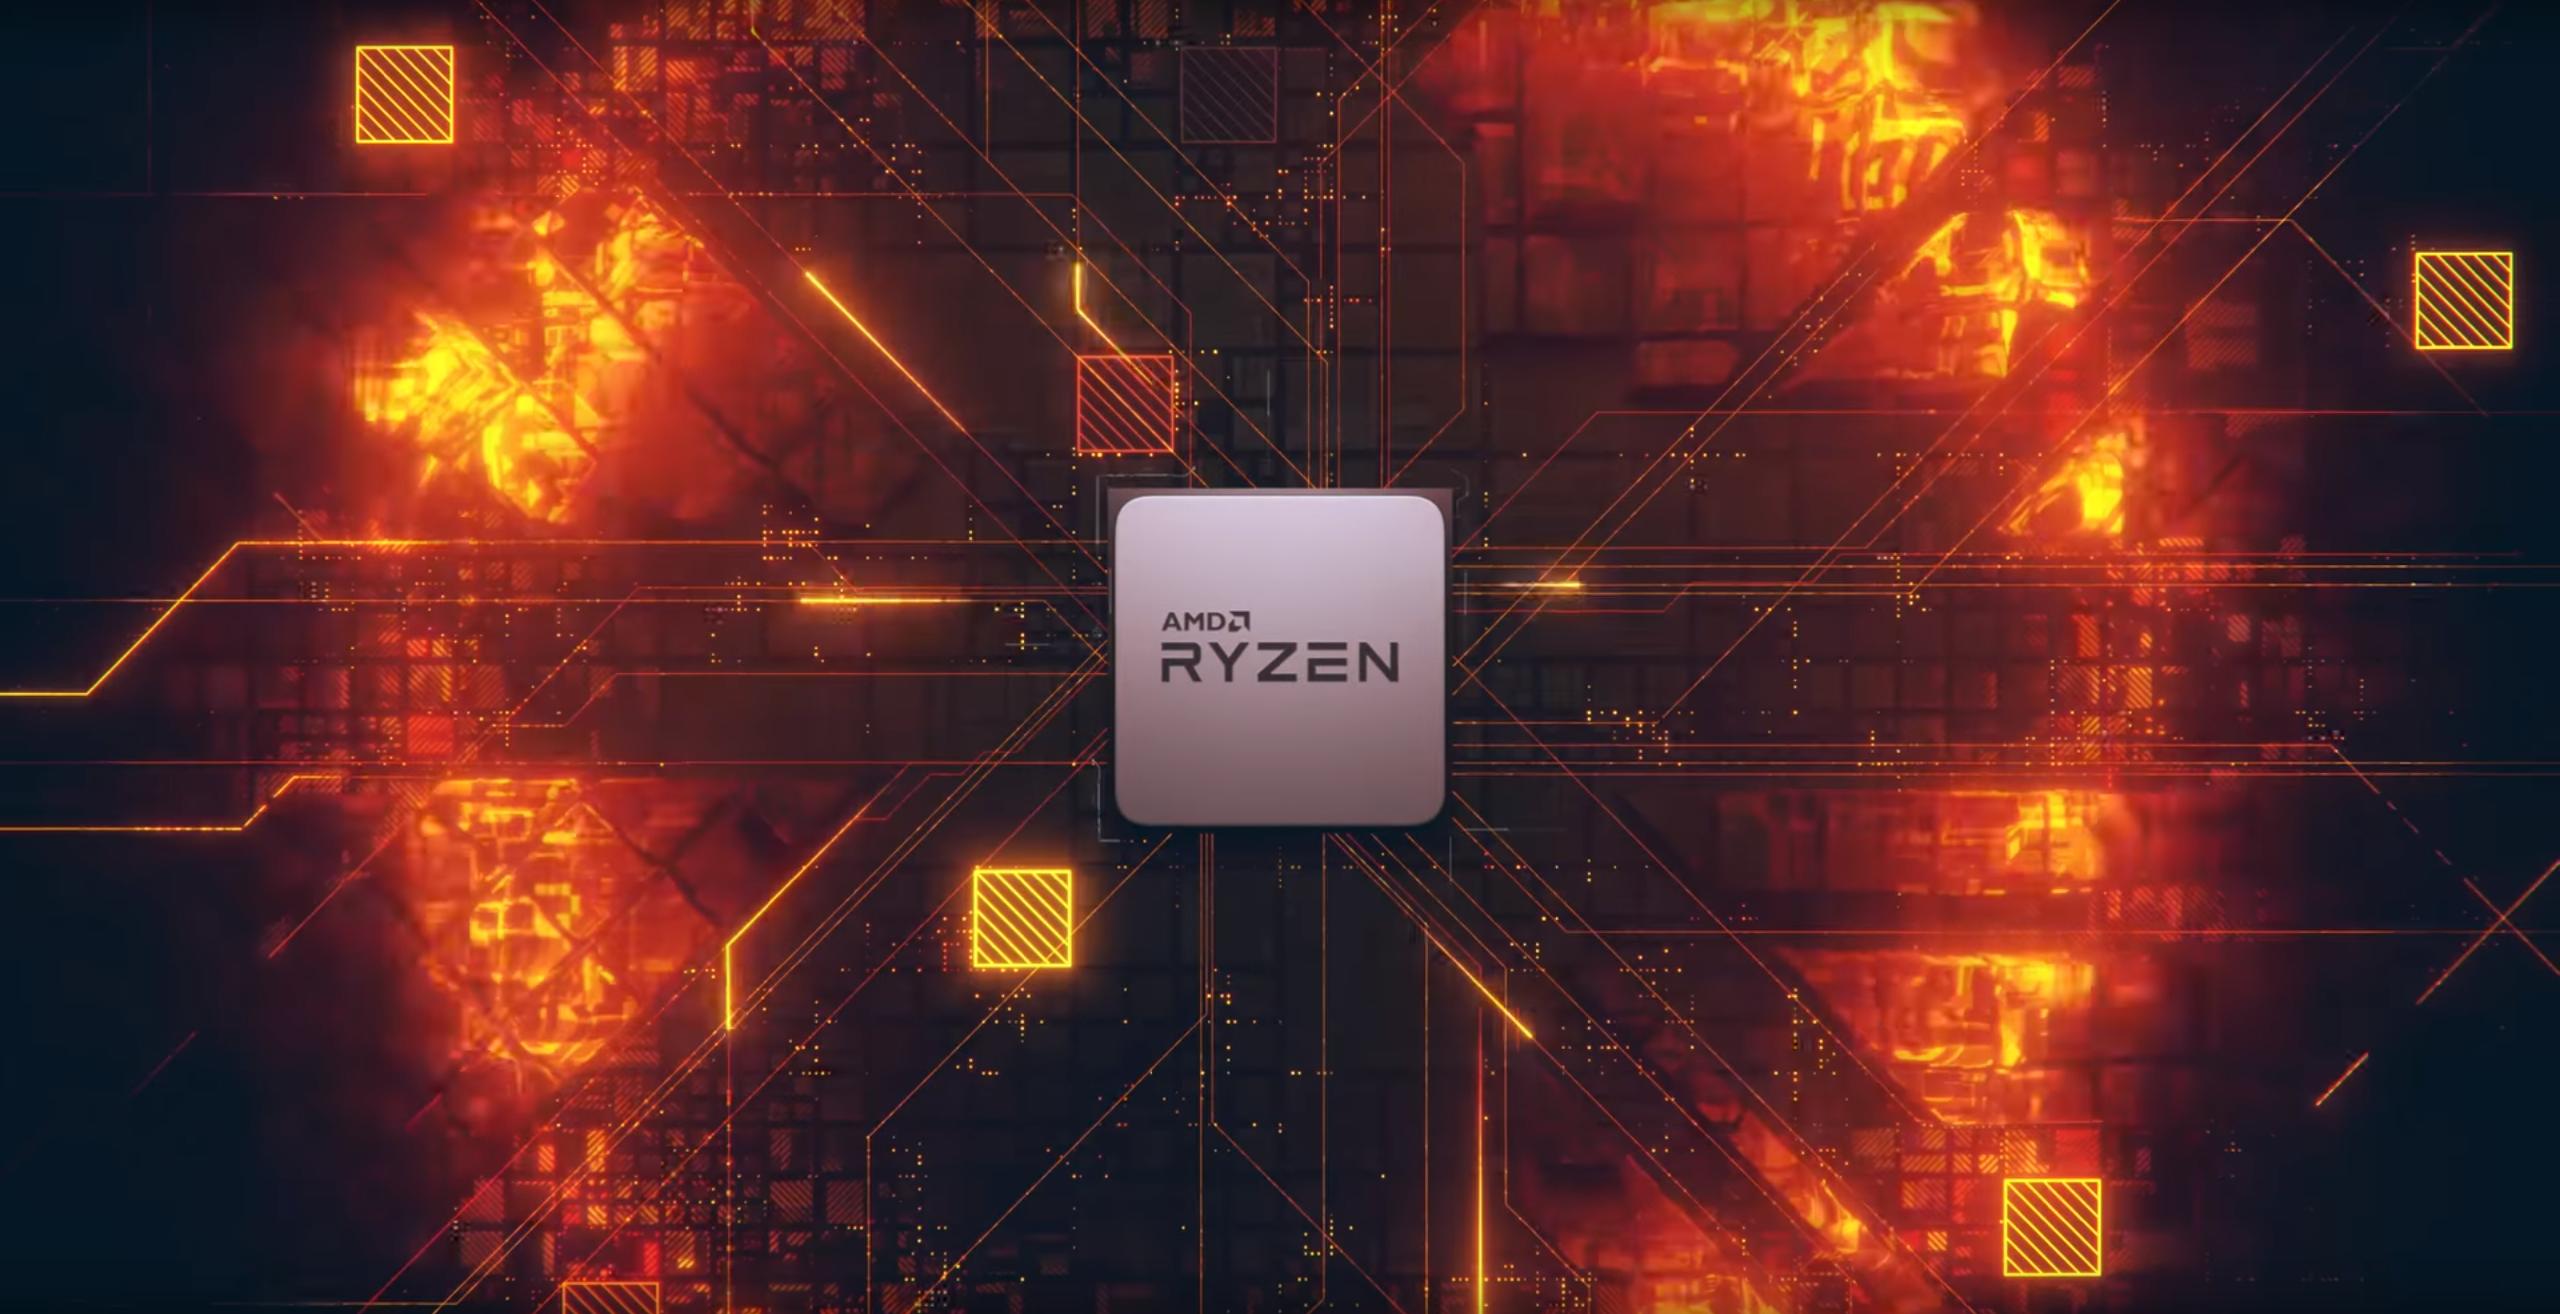 AMD Ryzen 3000 CPUs Get BIOS Support on X370 & X470 Motherboards